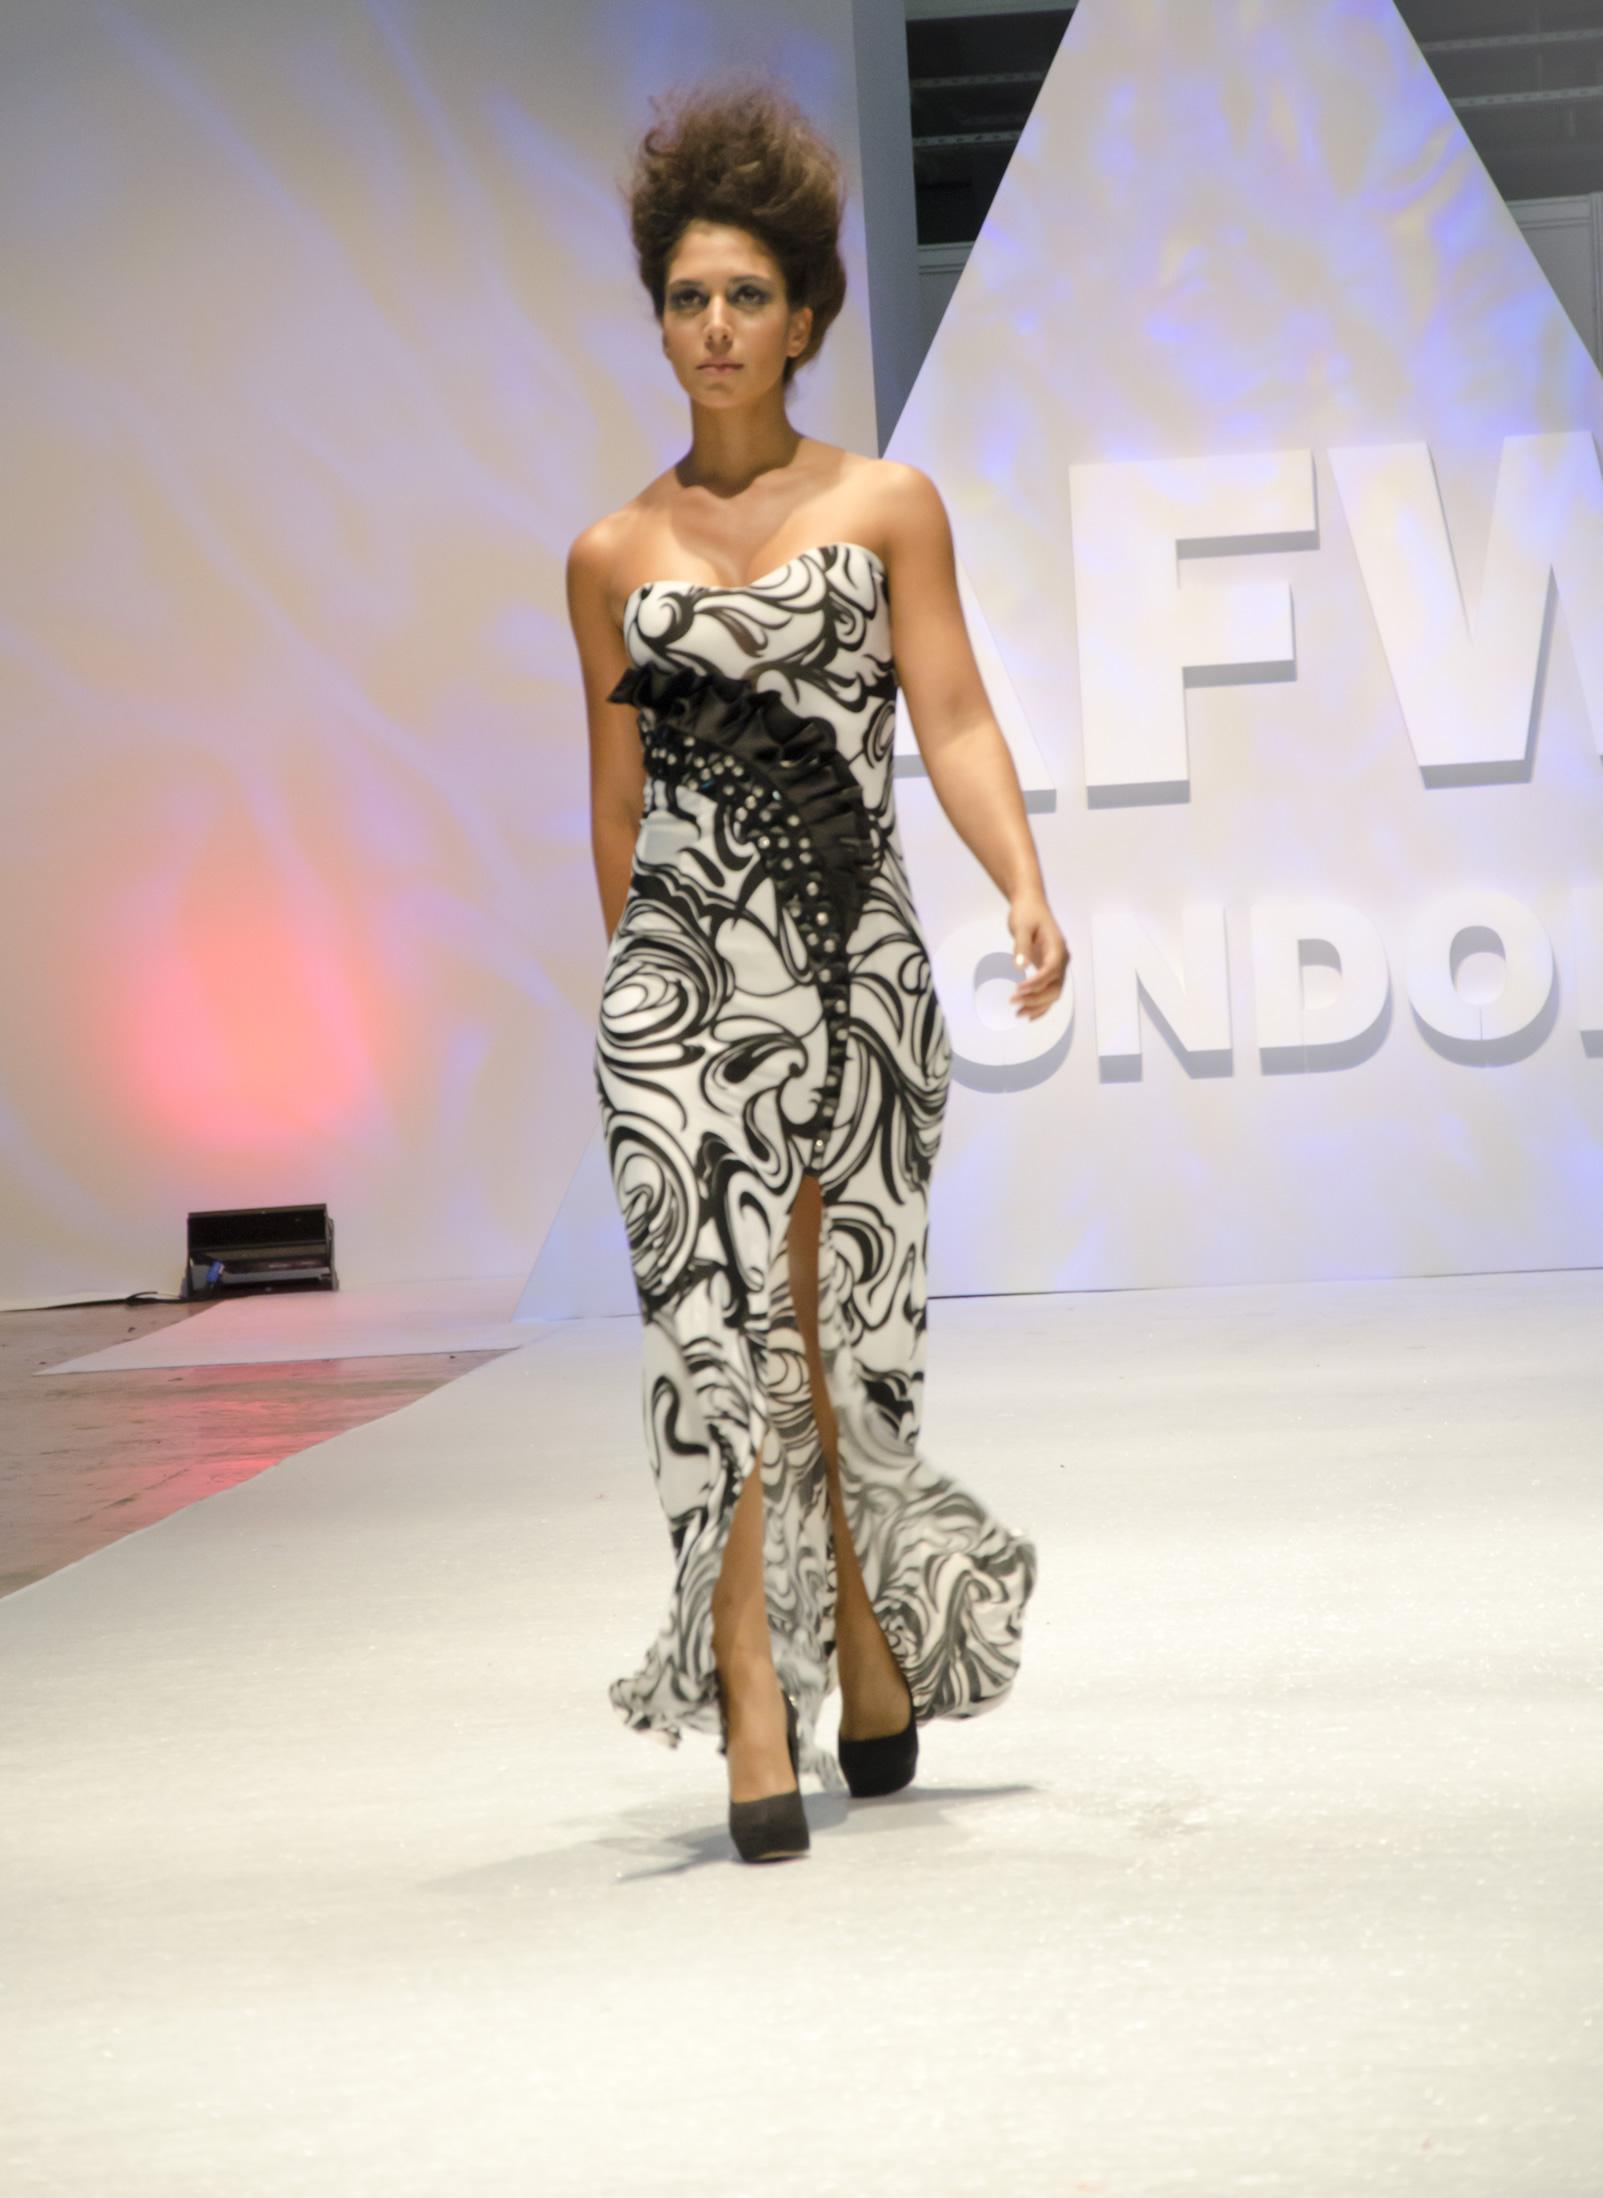 Miss-Boss-Fashion3.jpg